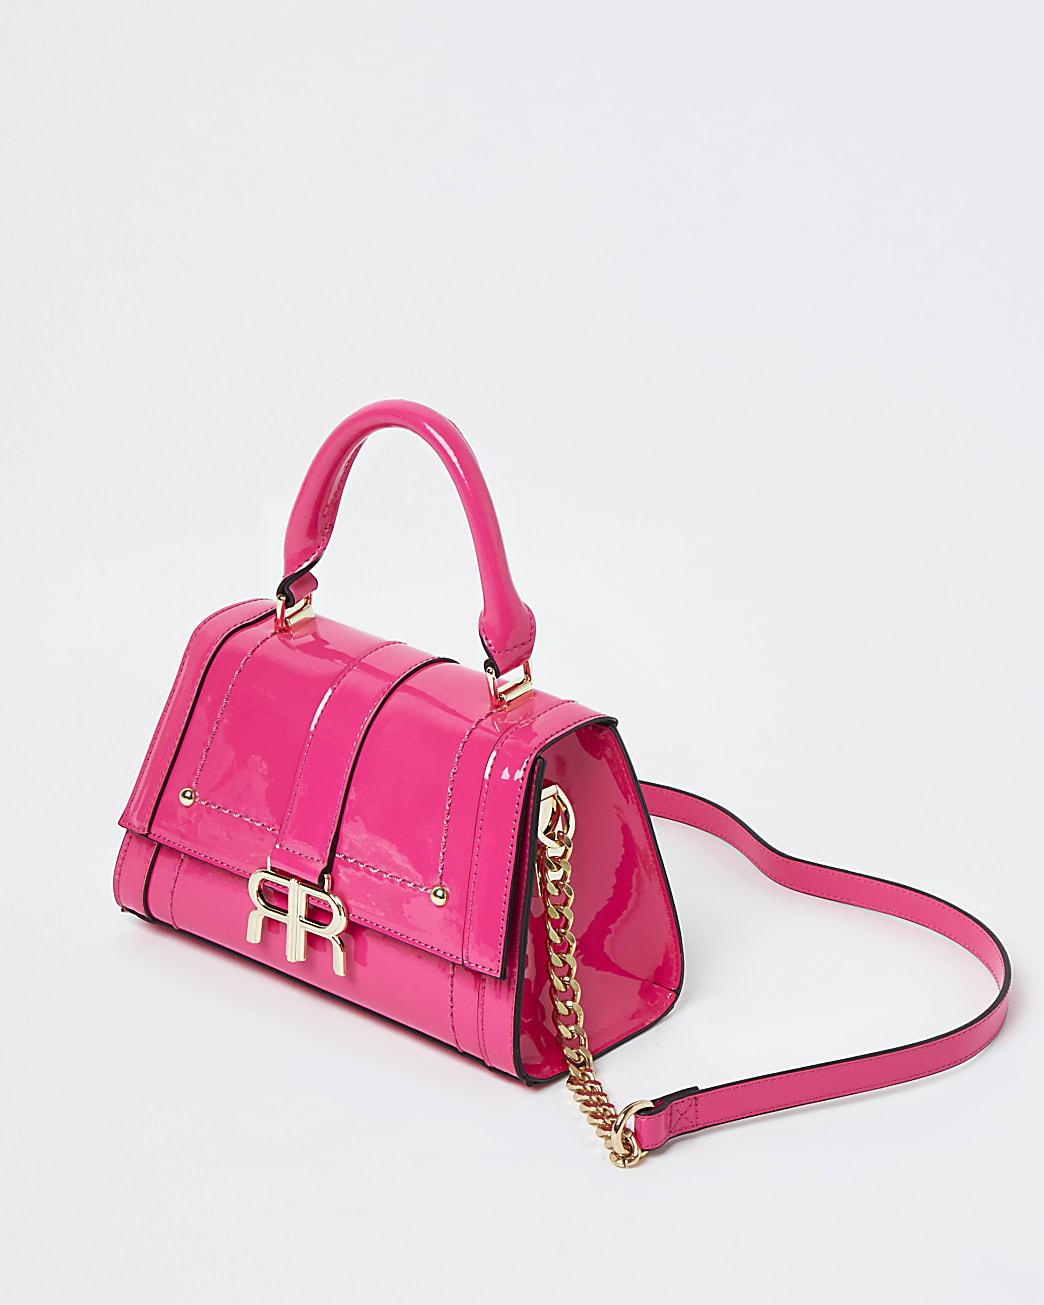 Pink neon mini tote bag